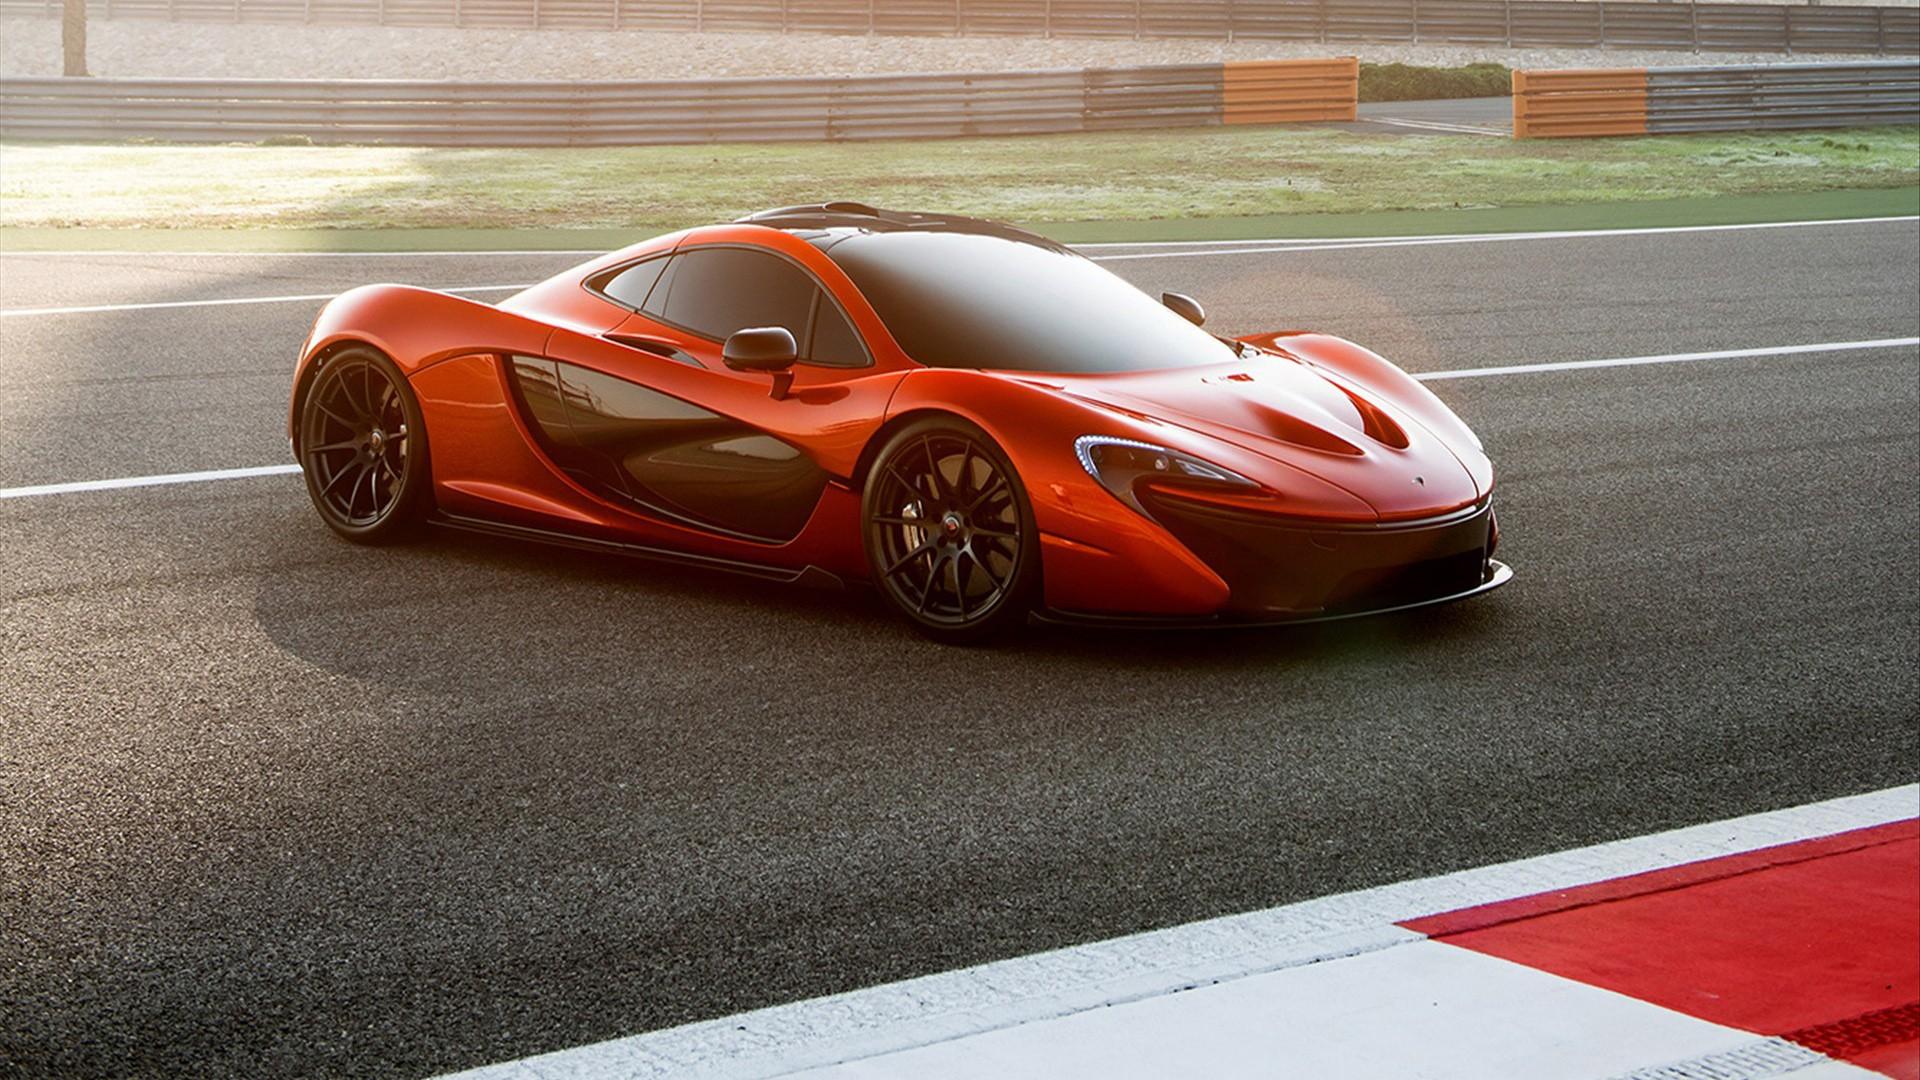 Mercedes Of Miami >> McLaren P1 2014 Wallpaper   HD Car Wallpapers   ID #3315